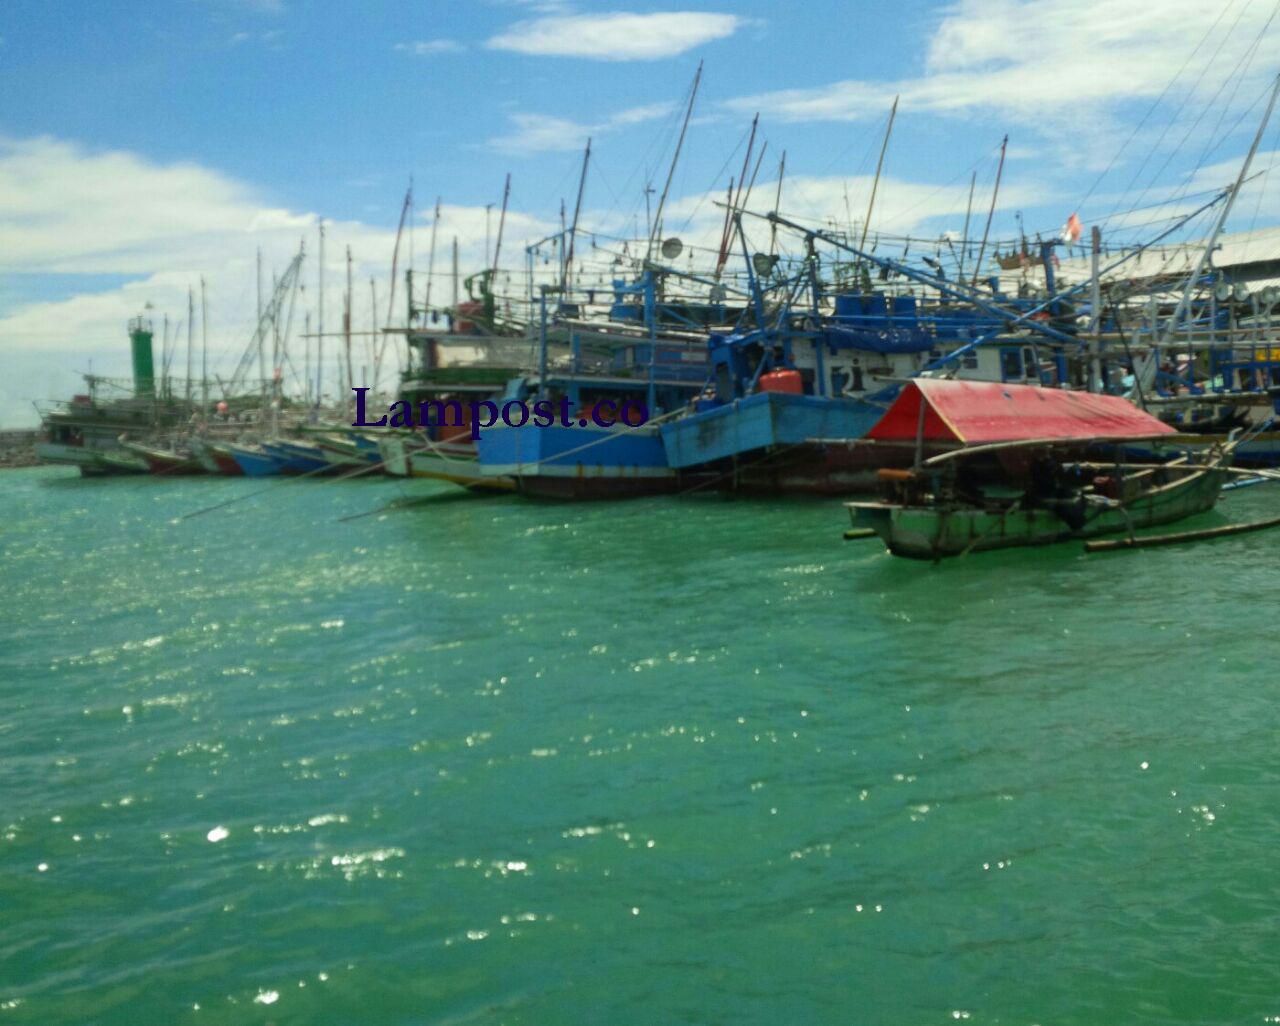 Cuaca Kembali Ekstrem, Nelayan di Lamsel Tak Melaut